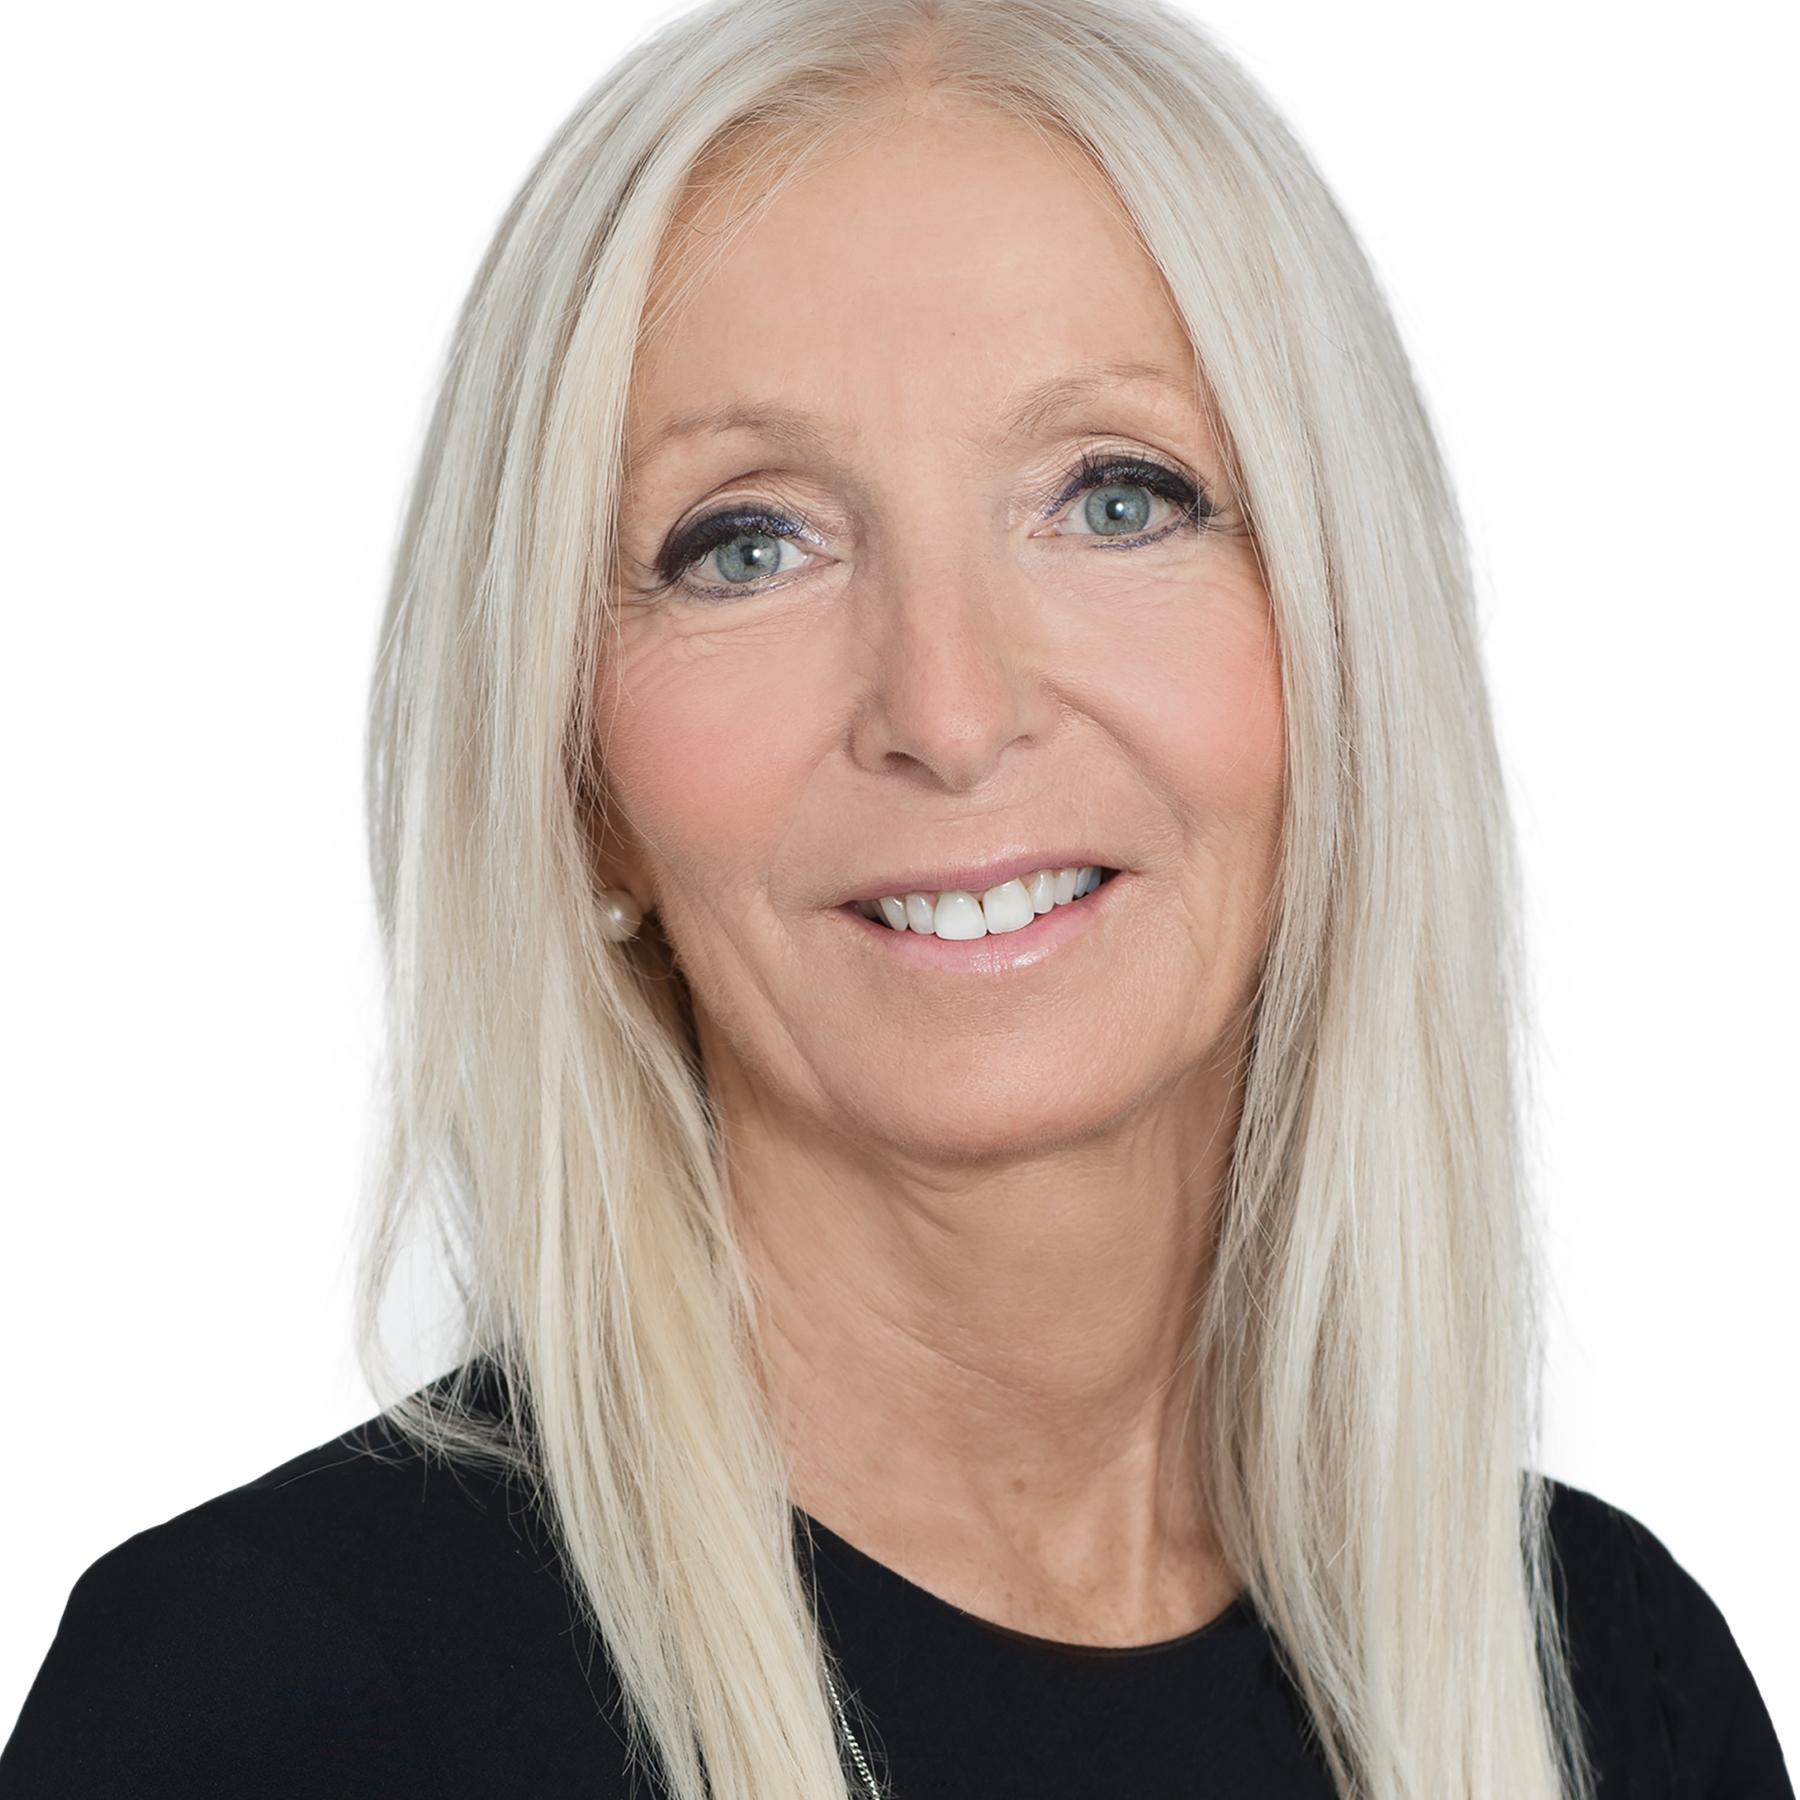 Marie-France Gibson